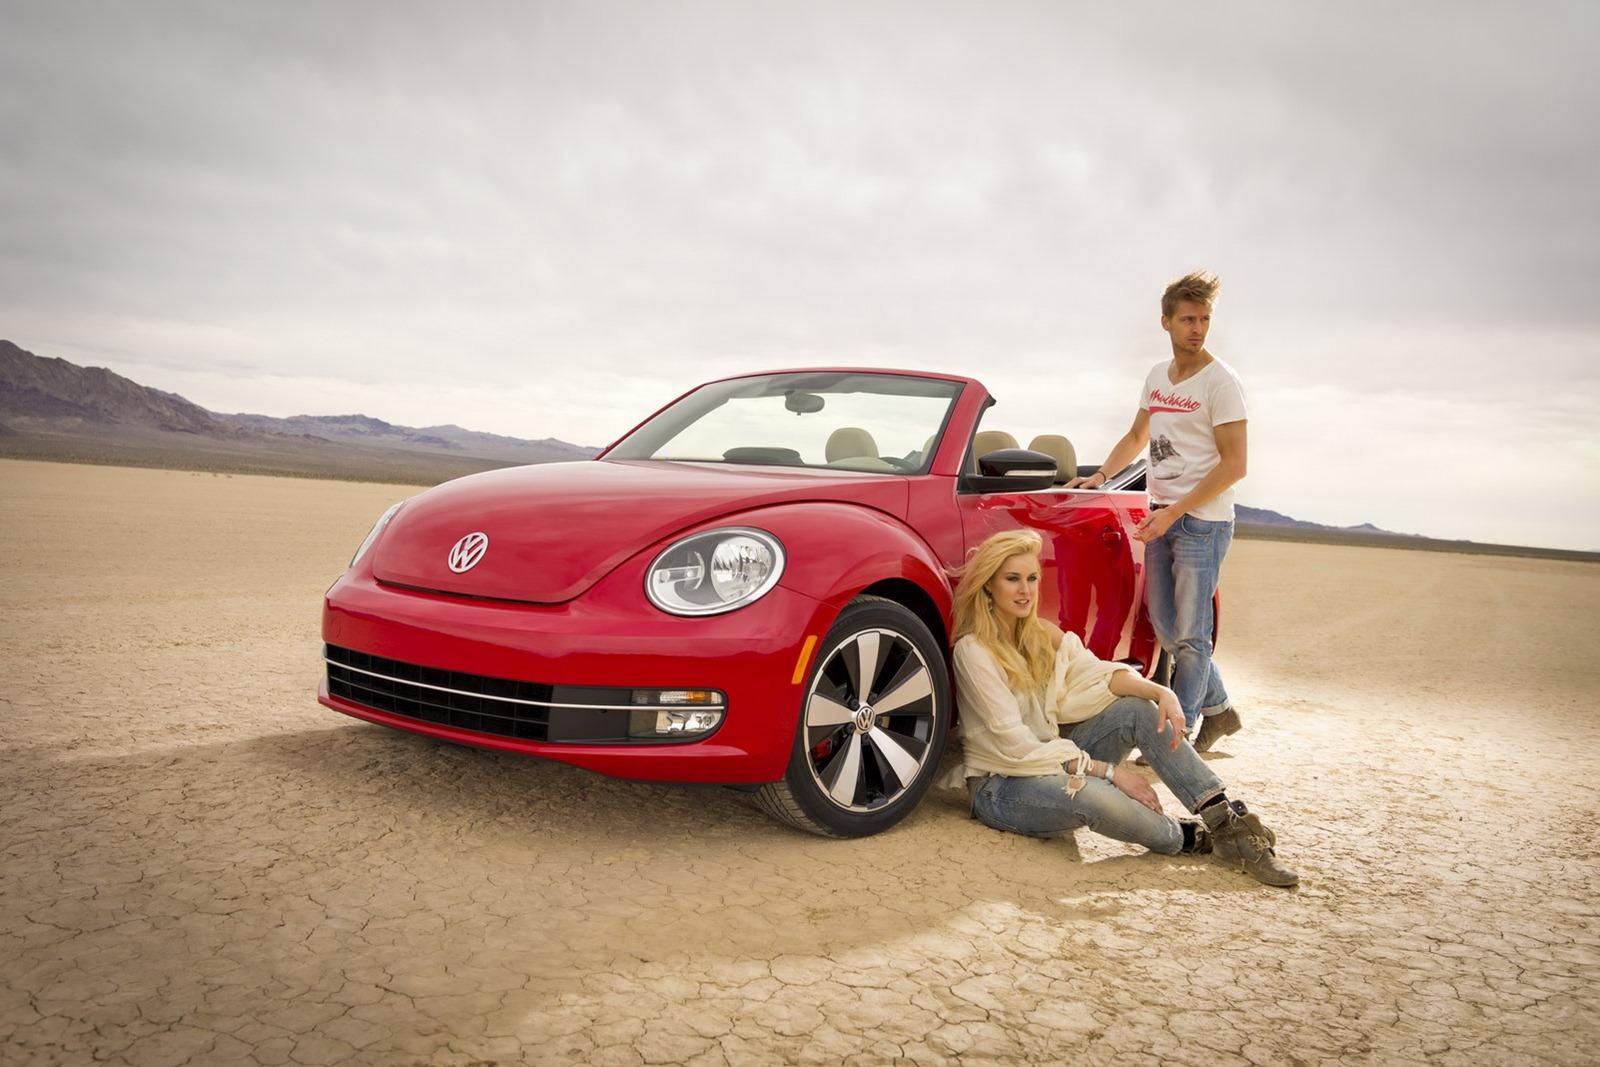 Volkswagen_Beetle_Cabriolet_Profile_Pose